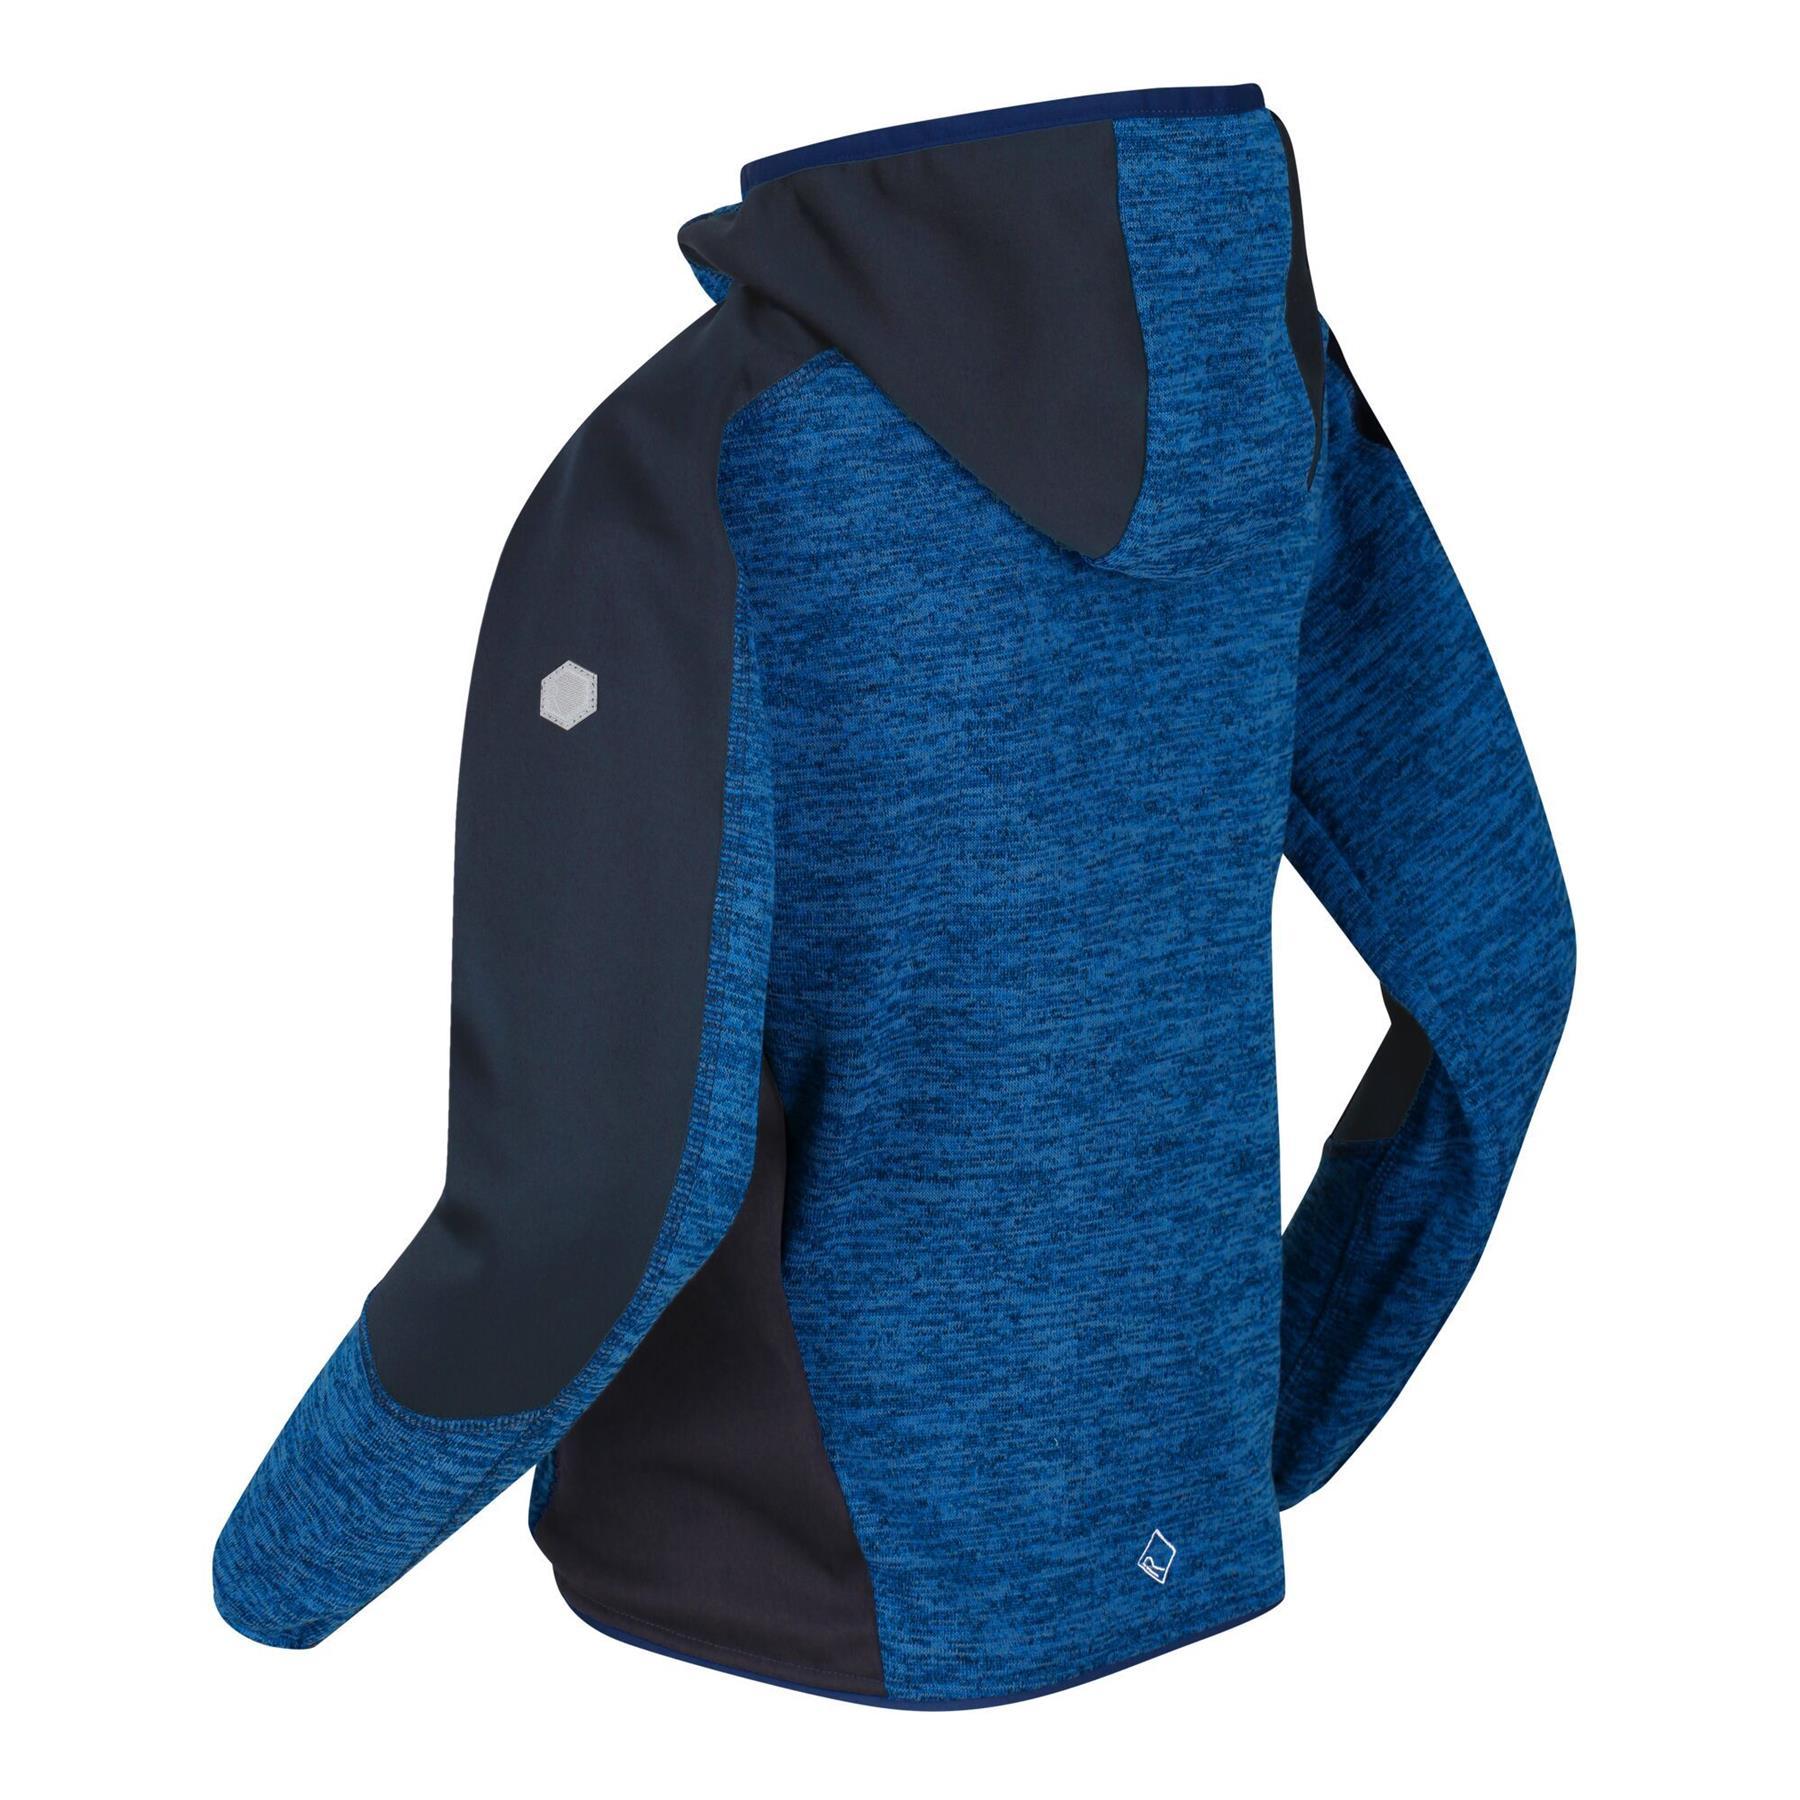 miniatuur 6 - Regatta Kids Dissolver III Full Zip Insulated Fleece Jacket Hoodie Boys Girls